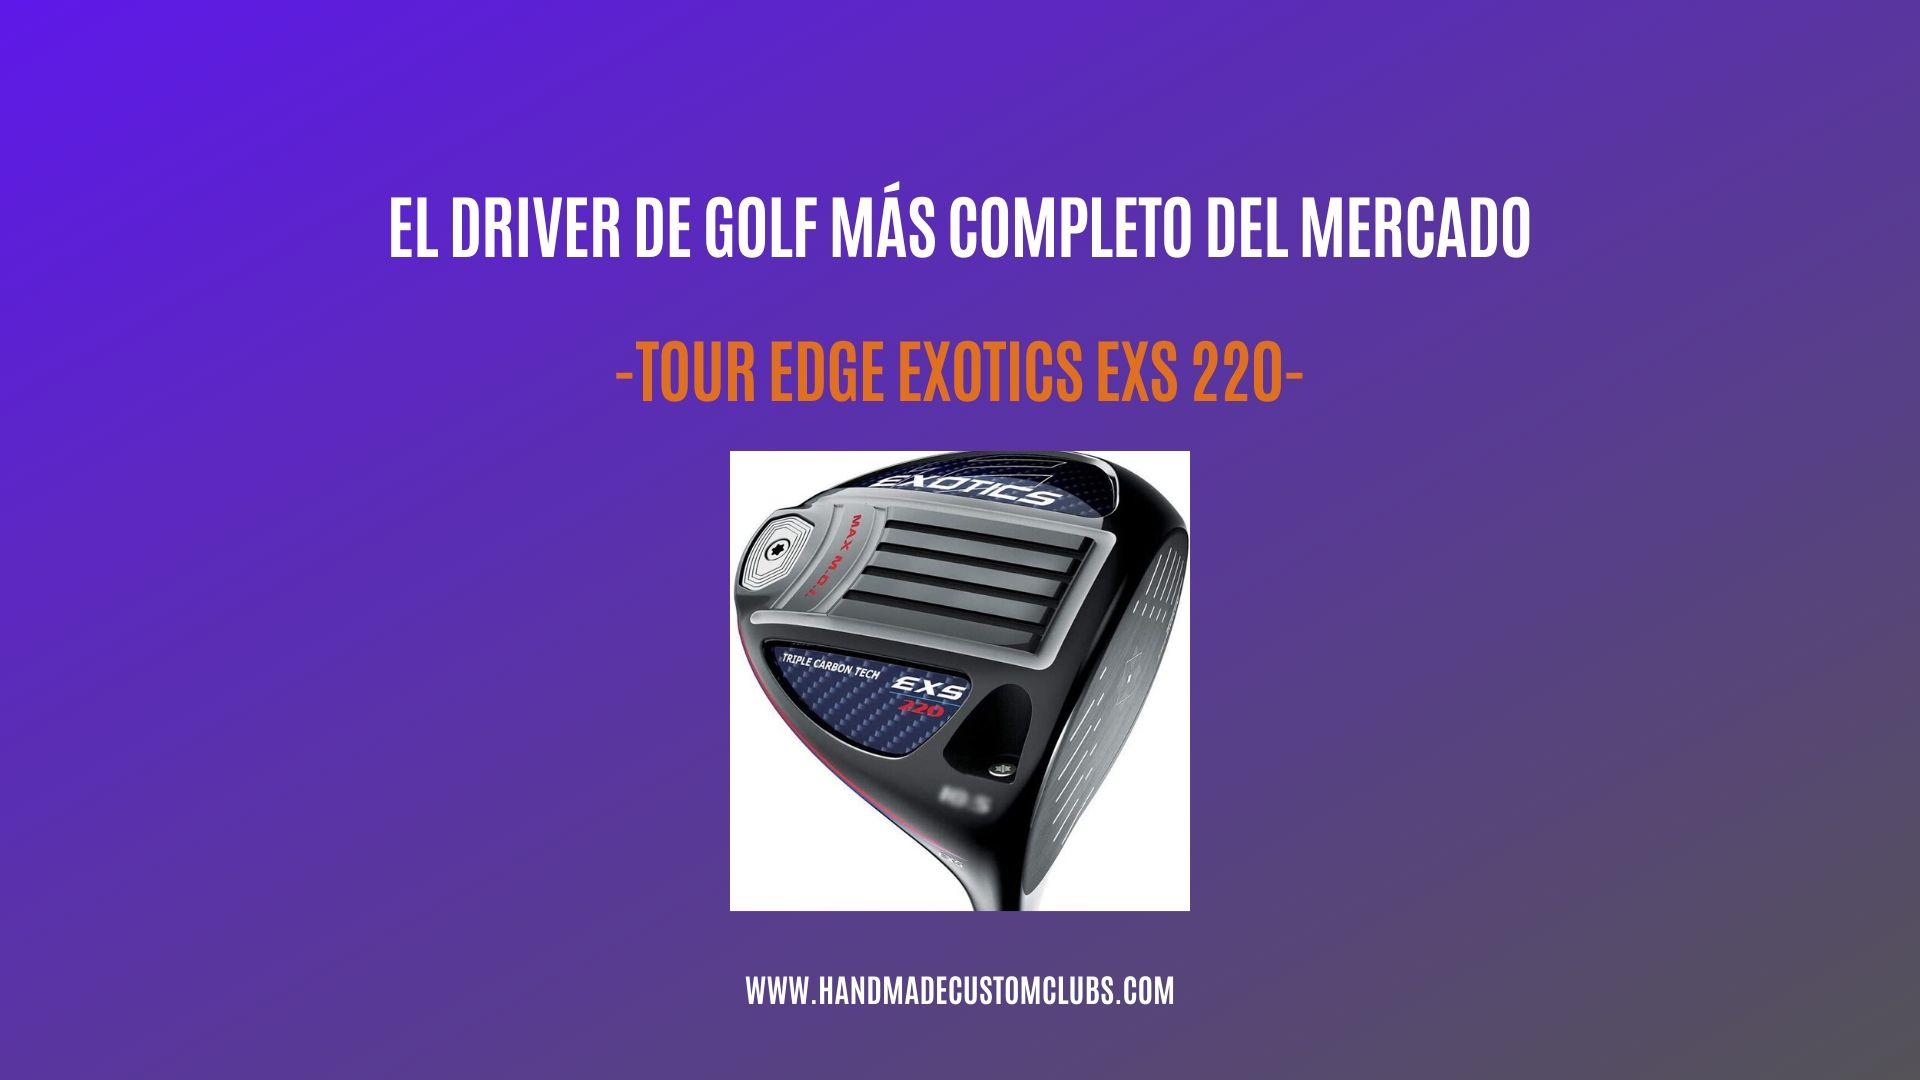 DRIVER DE GOLF TOUR EDGE EXOTICS